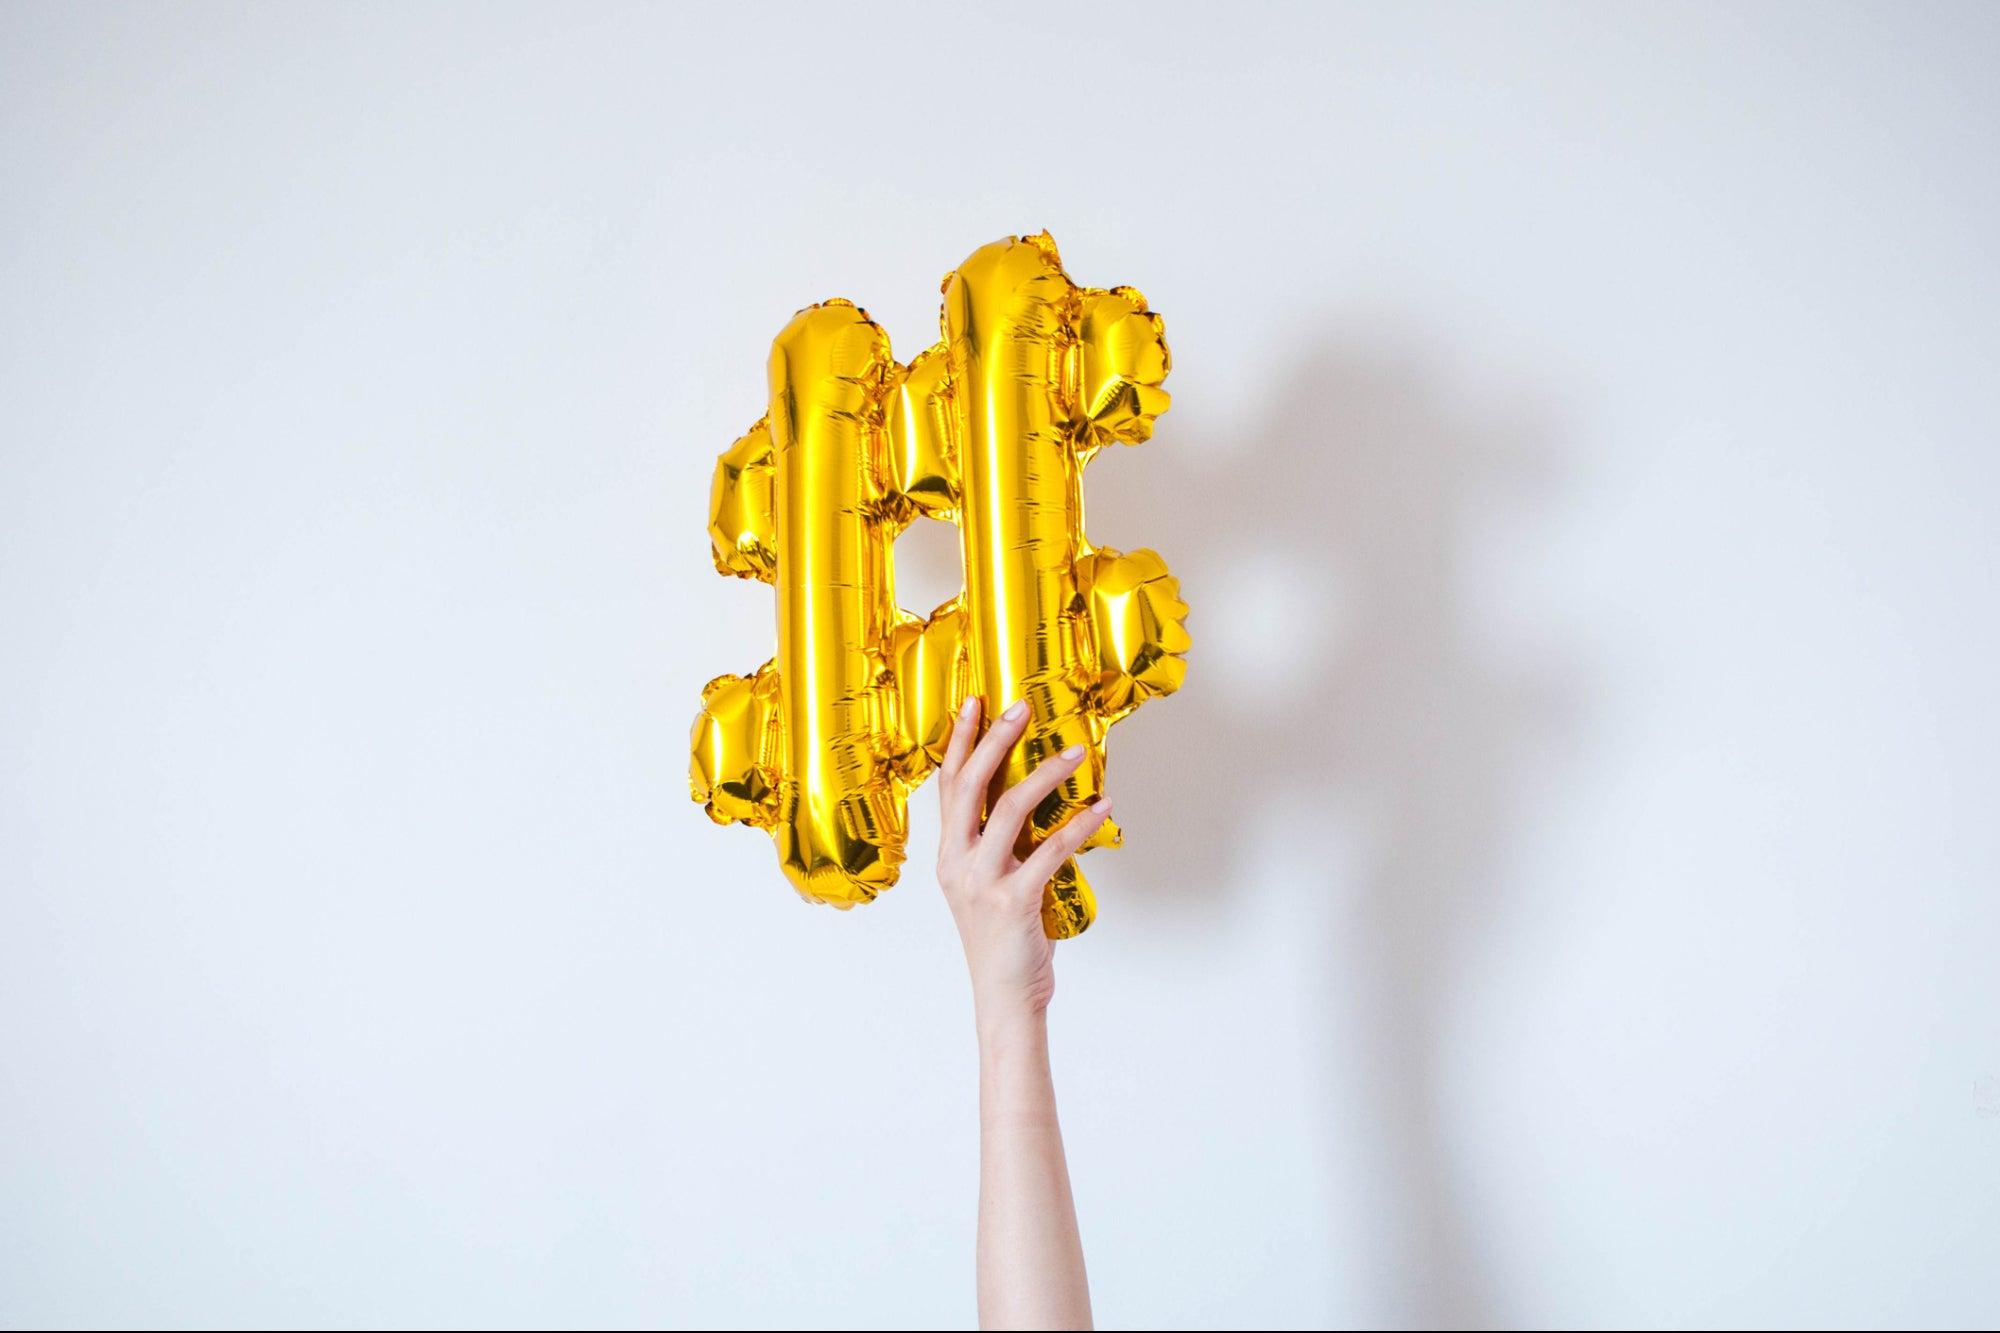 , 3 Social Media Hacks to Help Your Content Go Viral, Saubio Making Wealth